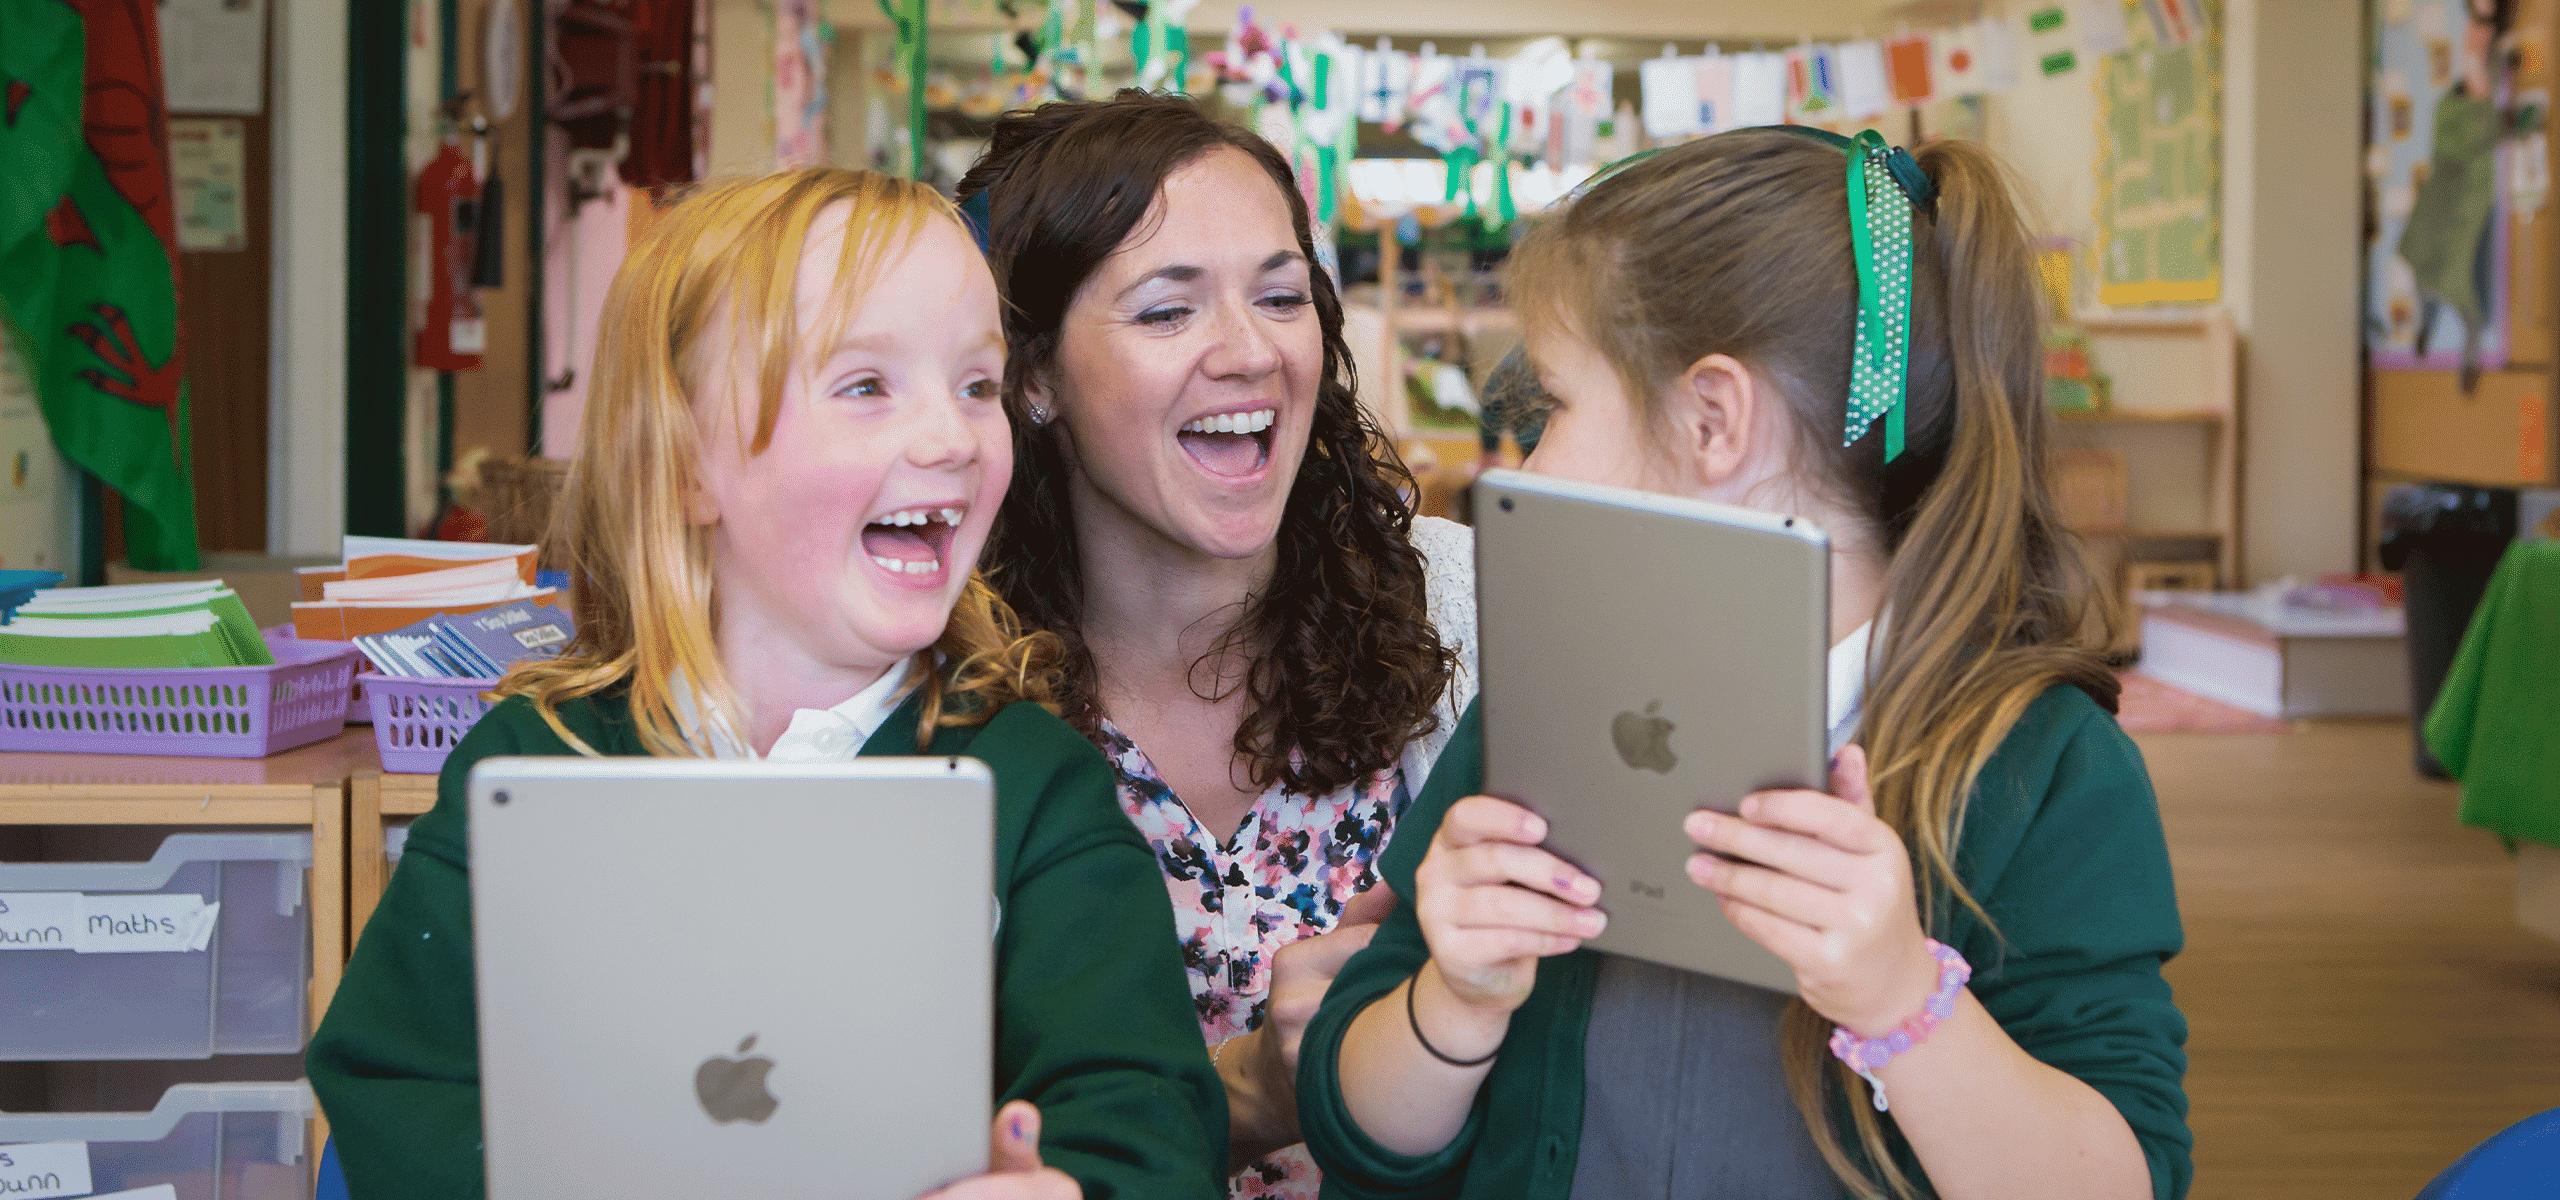 Trust Innovation Programme iPad 1:1